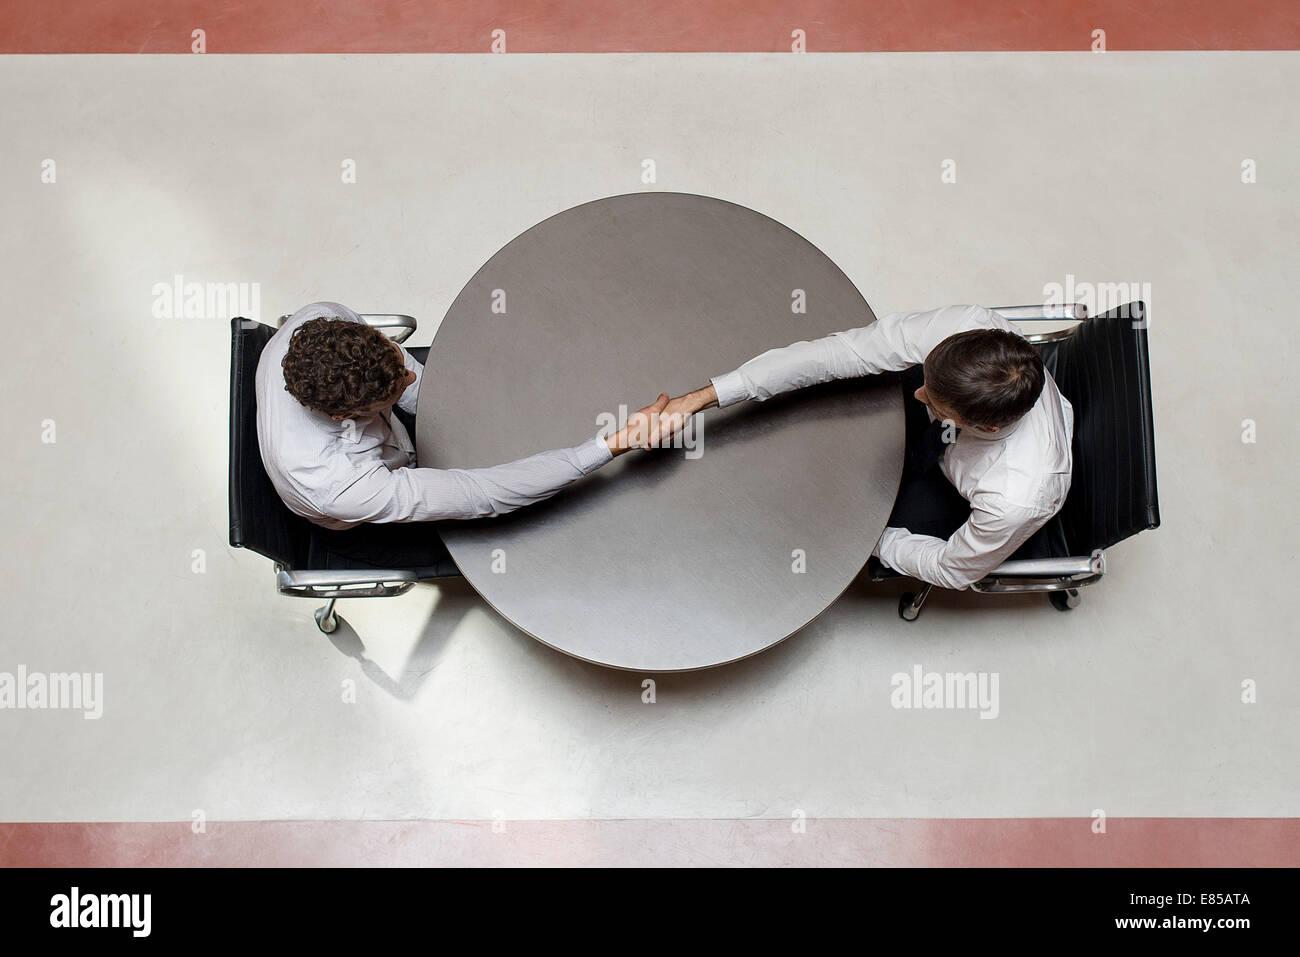 Businessmen shaking hands - Stock Image